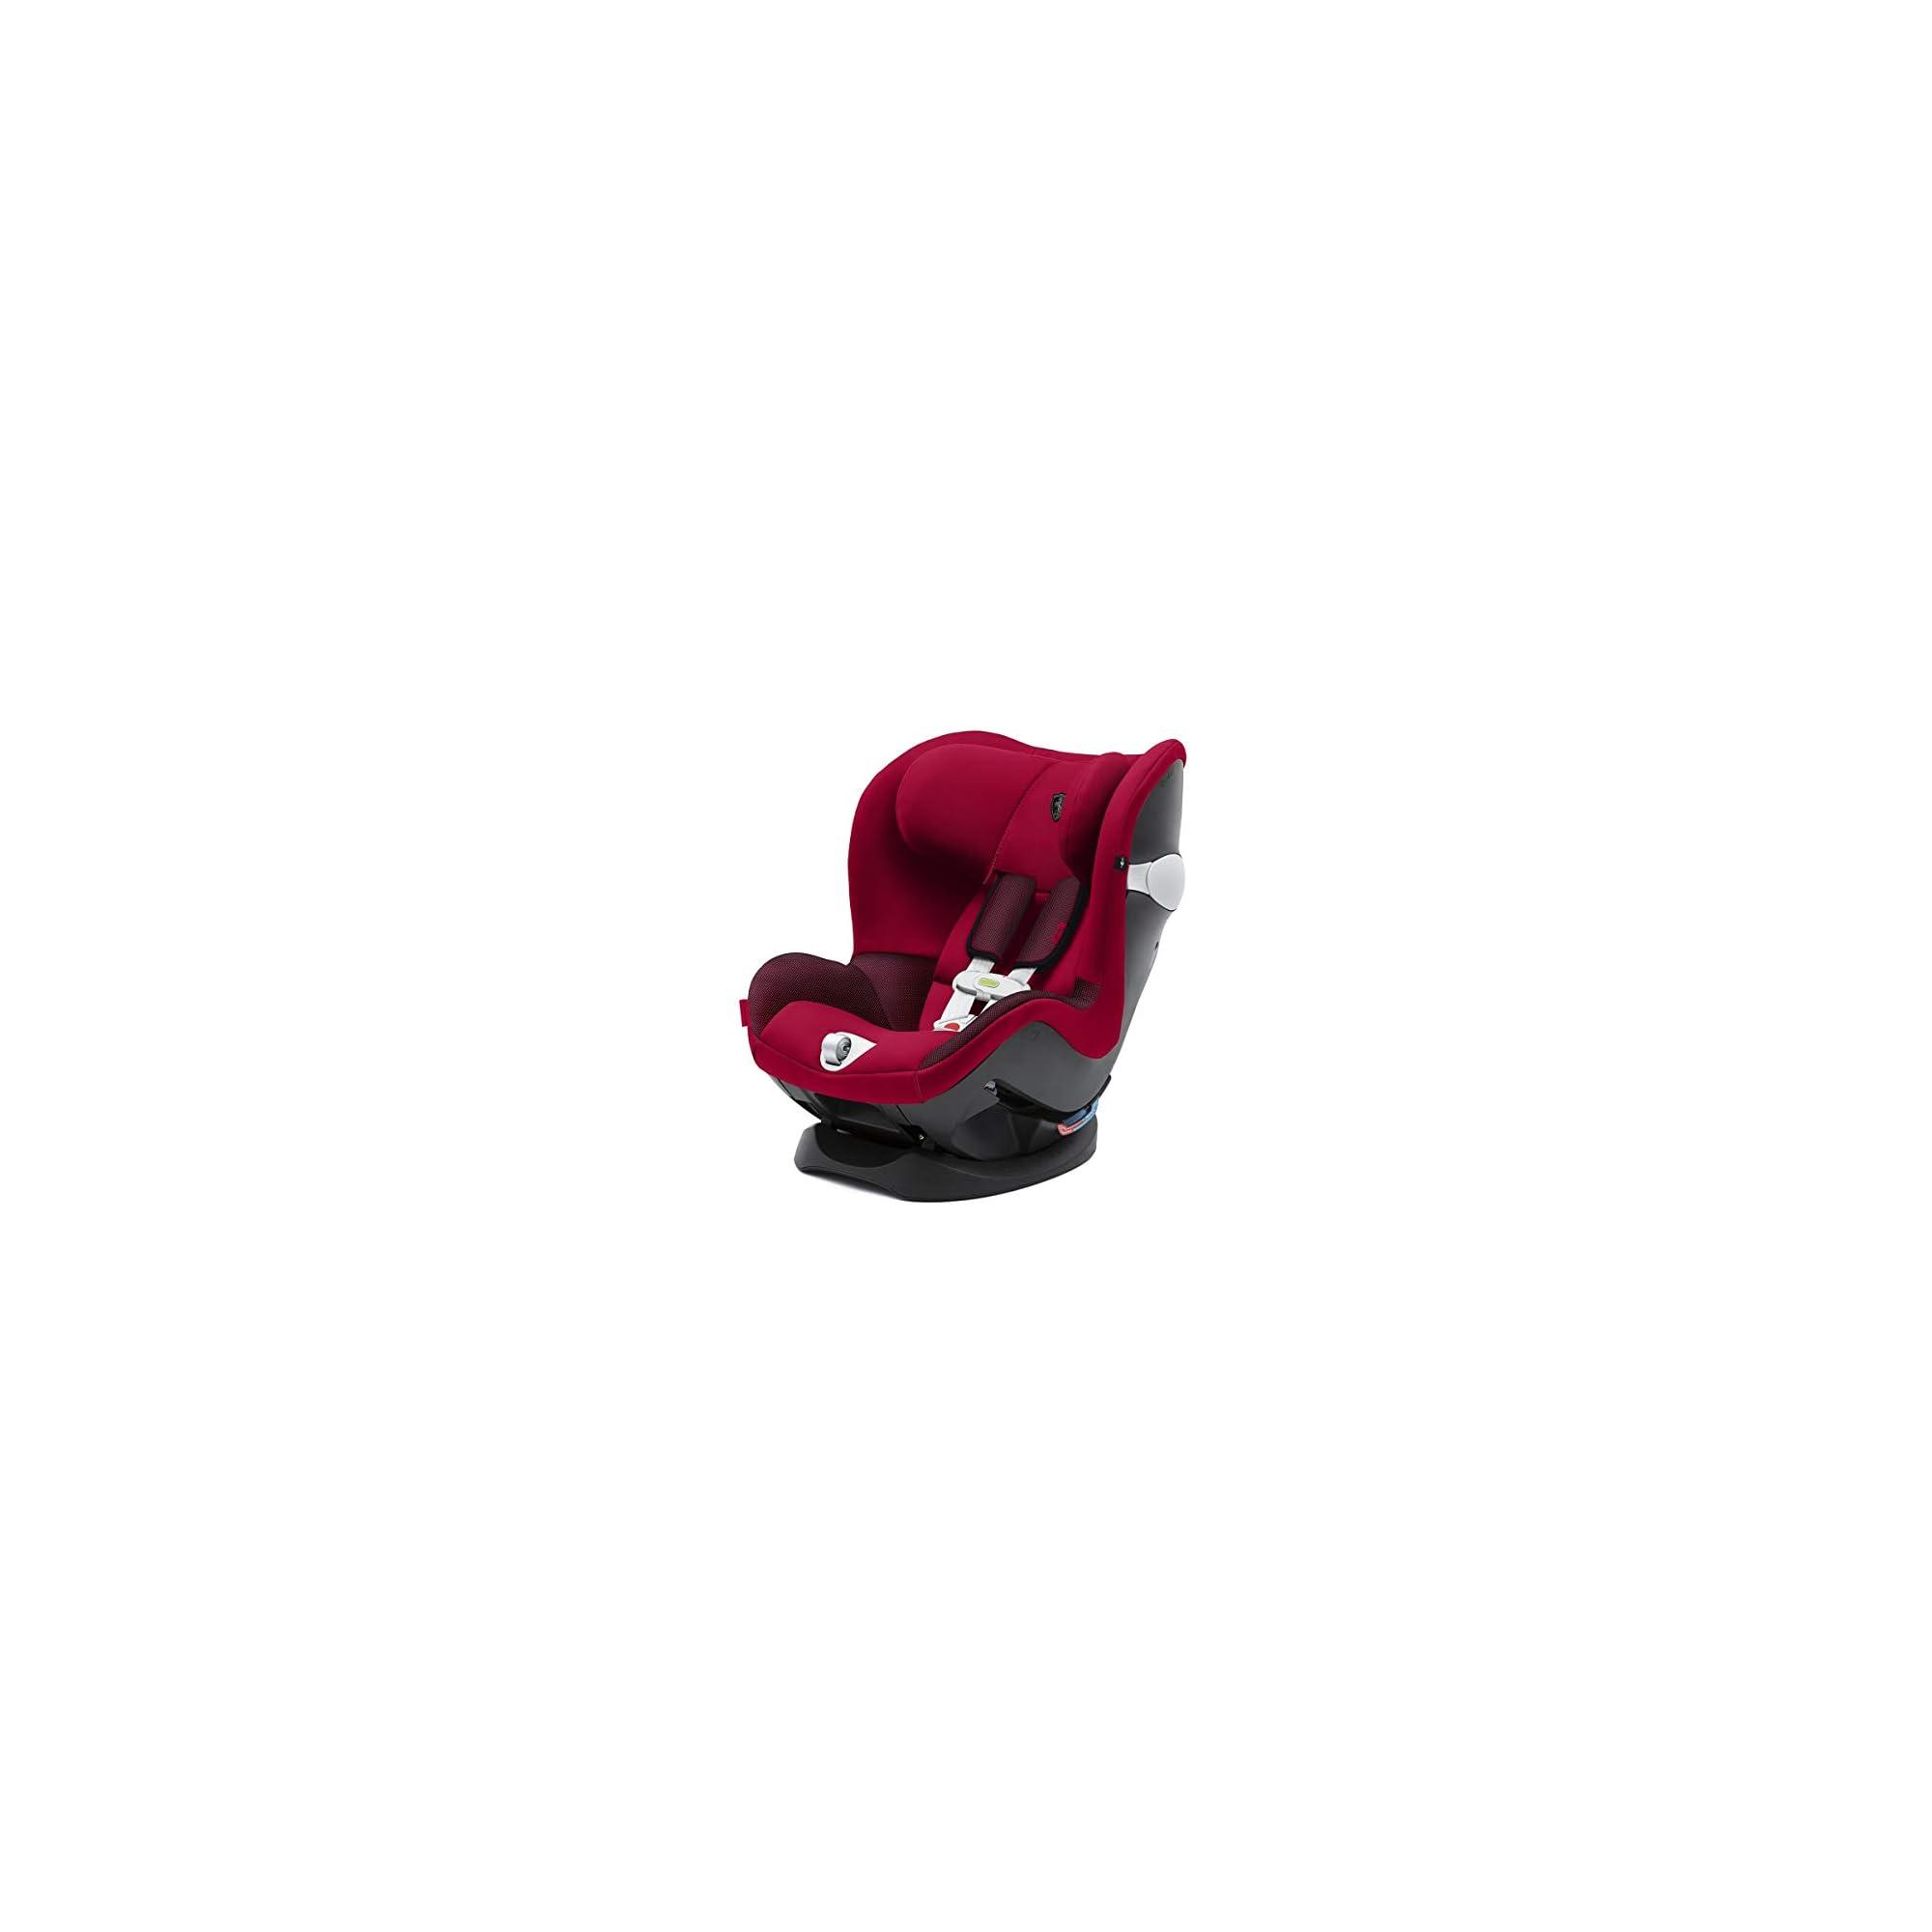 CYBEX Sirona M Sensorsafe 2.0 Convertible Car Seat, Racing Red